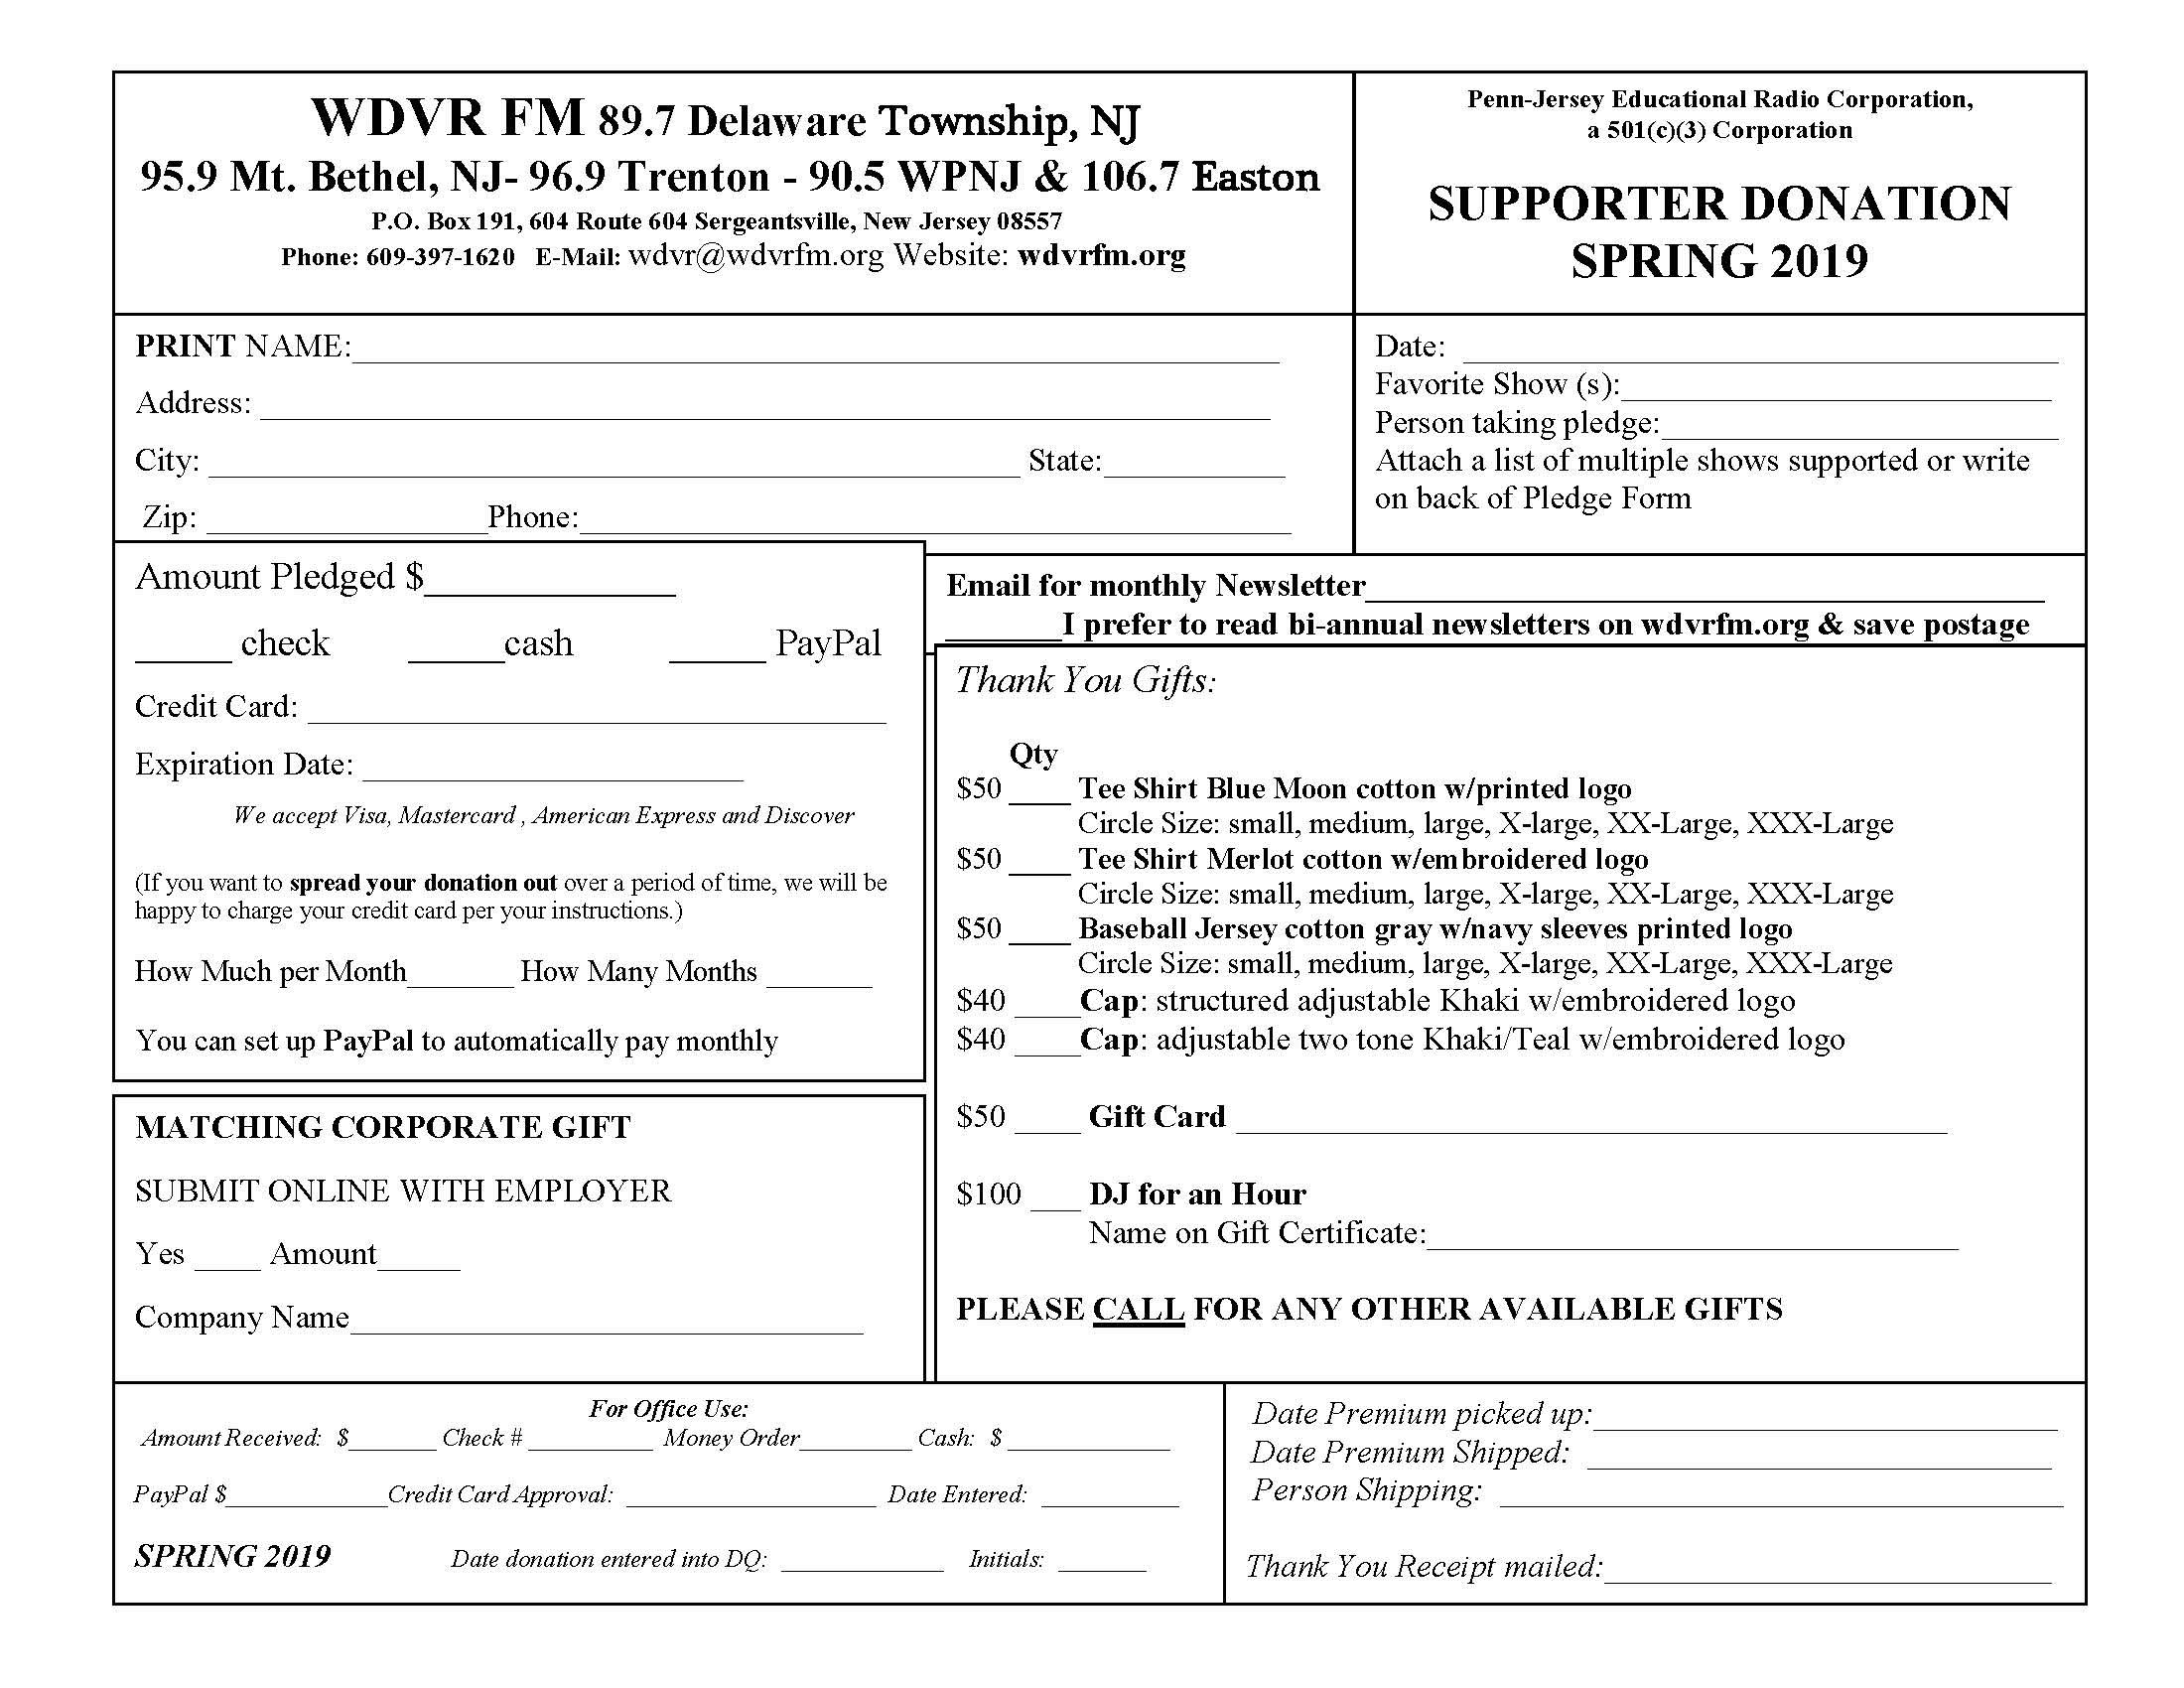 Pledge form SPRING 2019 .jpg